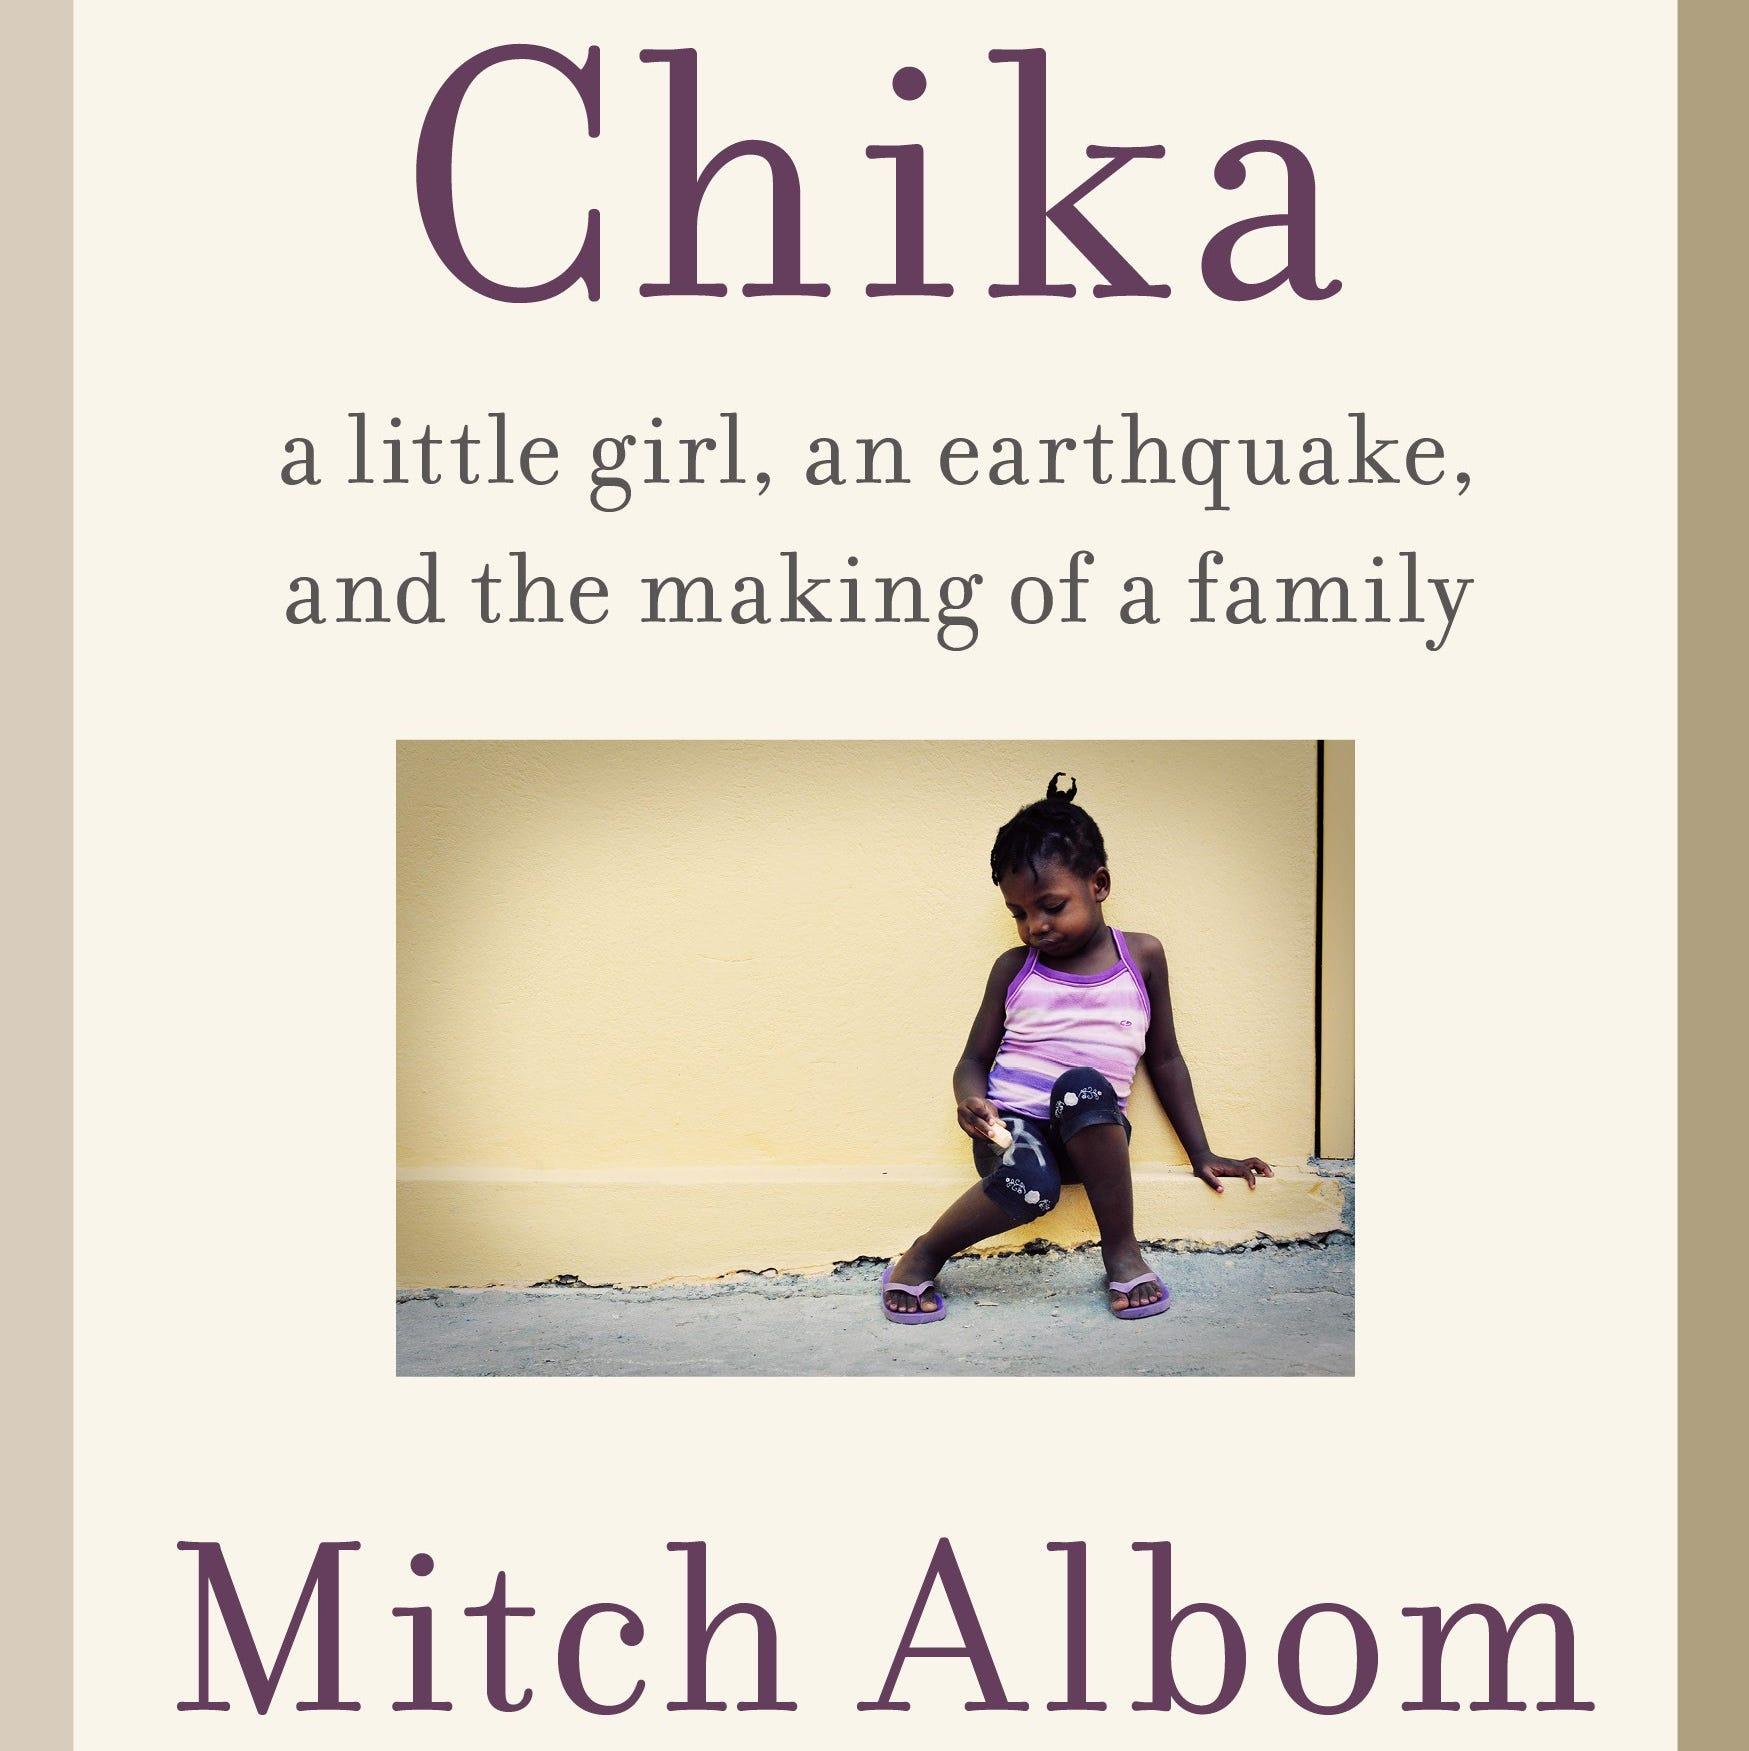 New Mitch Albom book, 'Chika,' written 'through a few tears,' coming in November